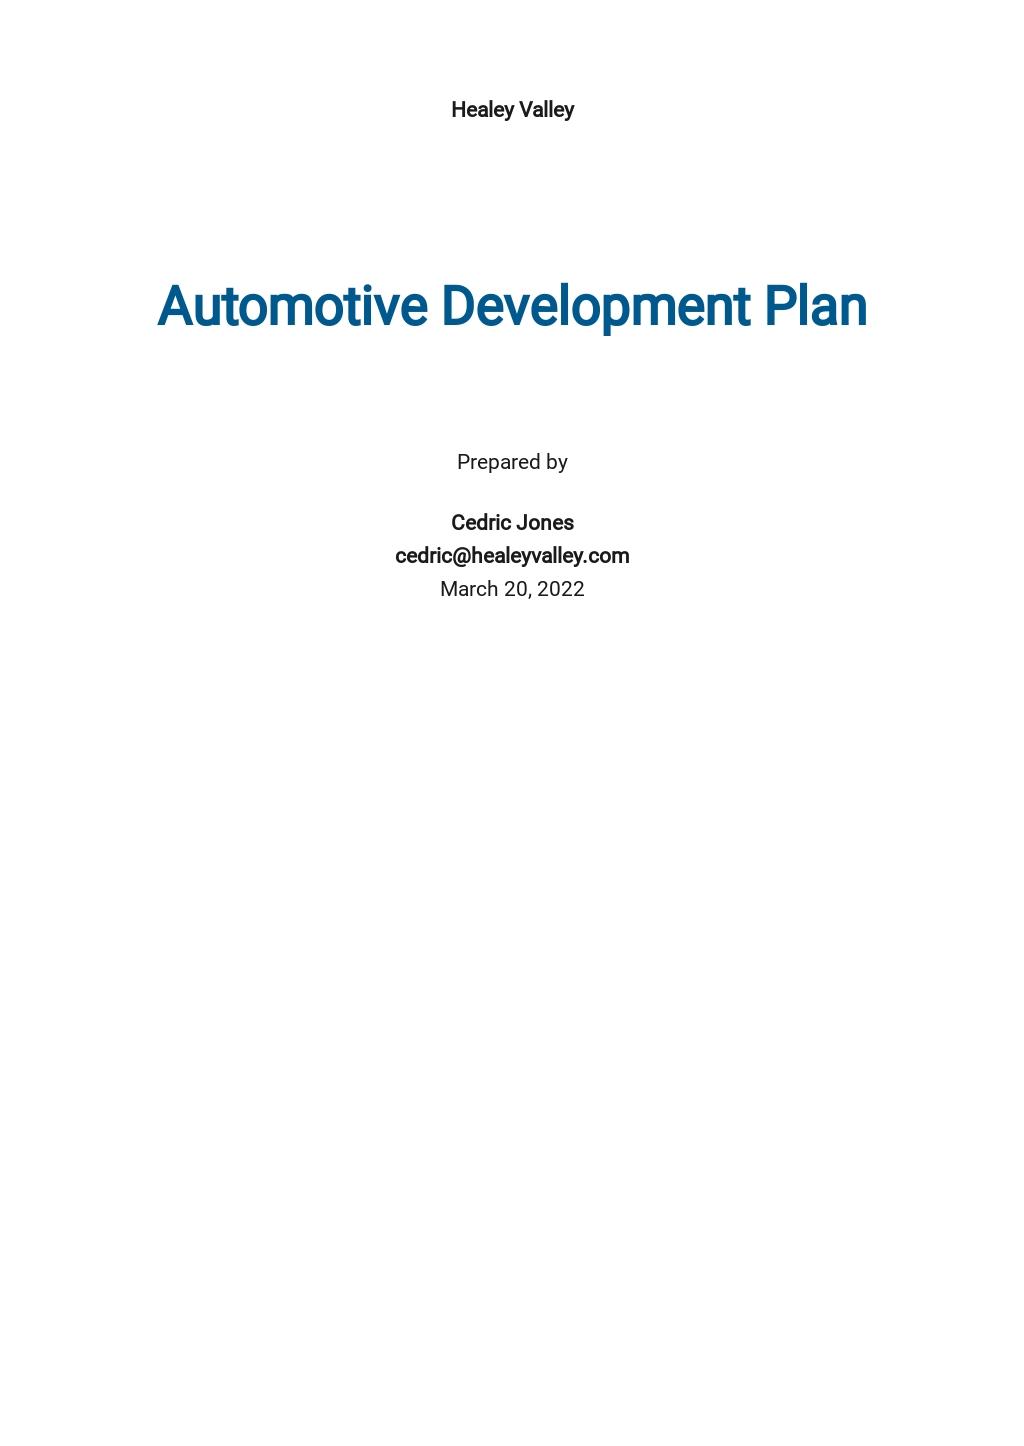 Automotive Development Plan Template